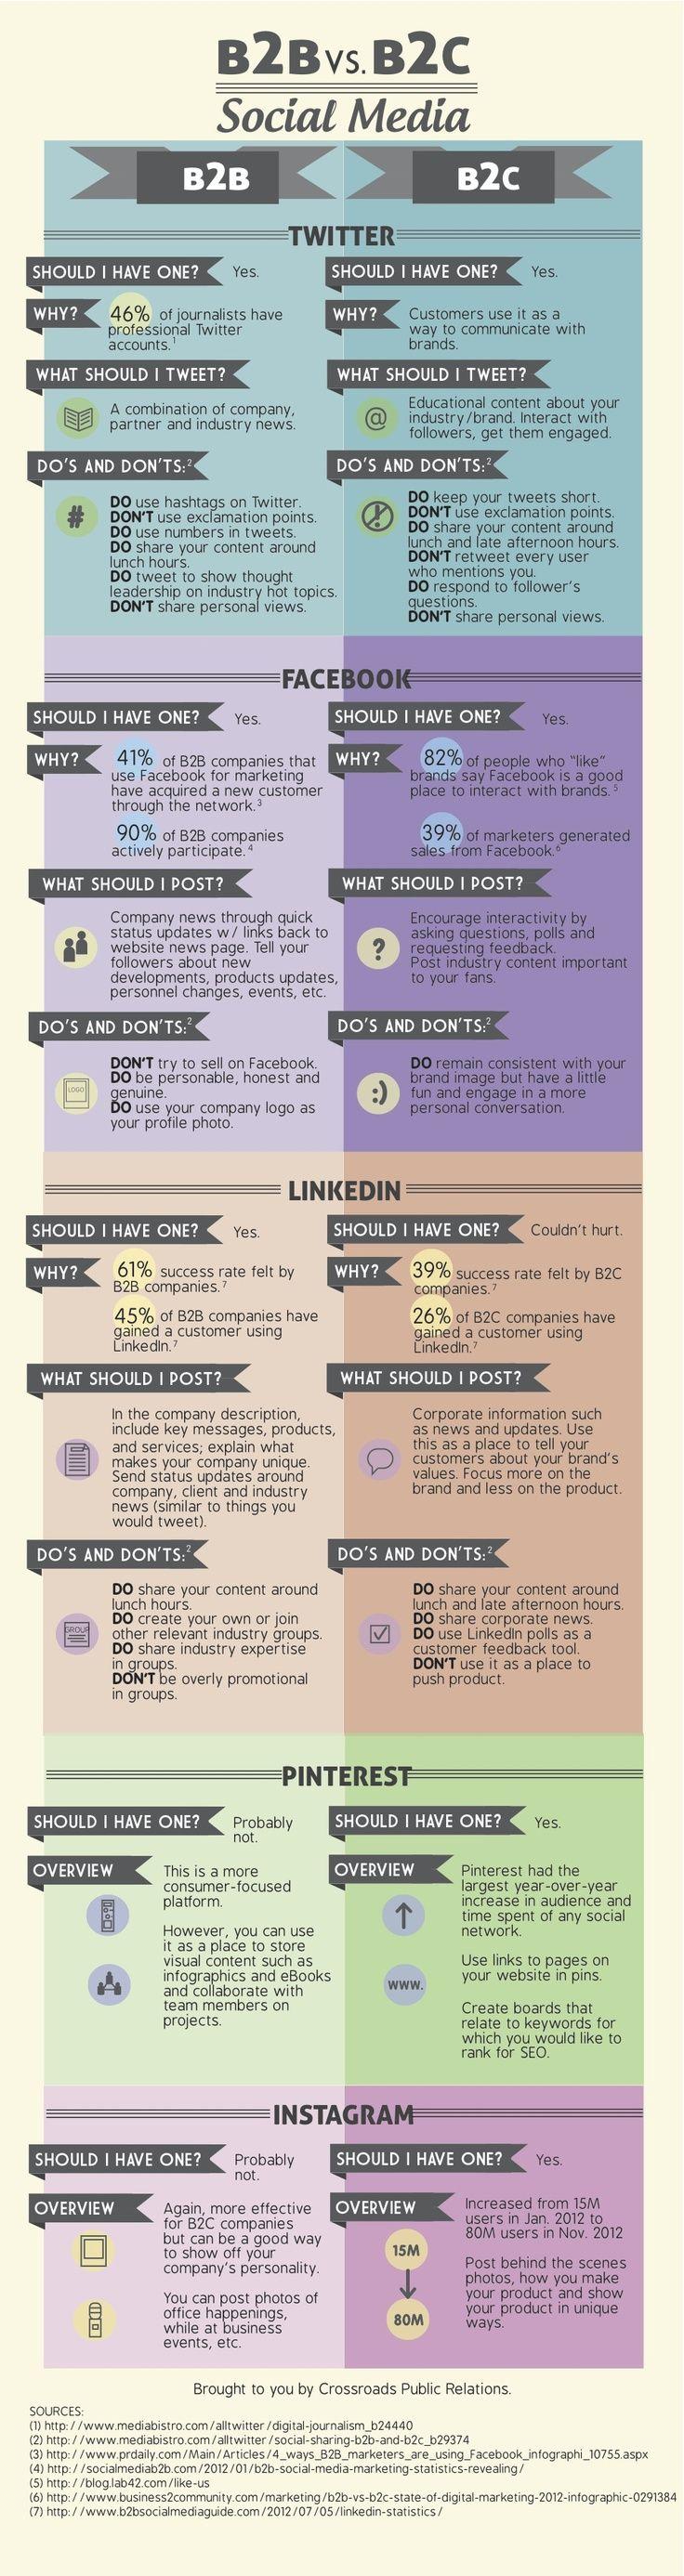 B2B and B2C Social media tips.